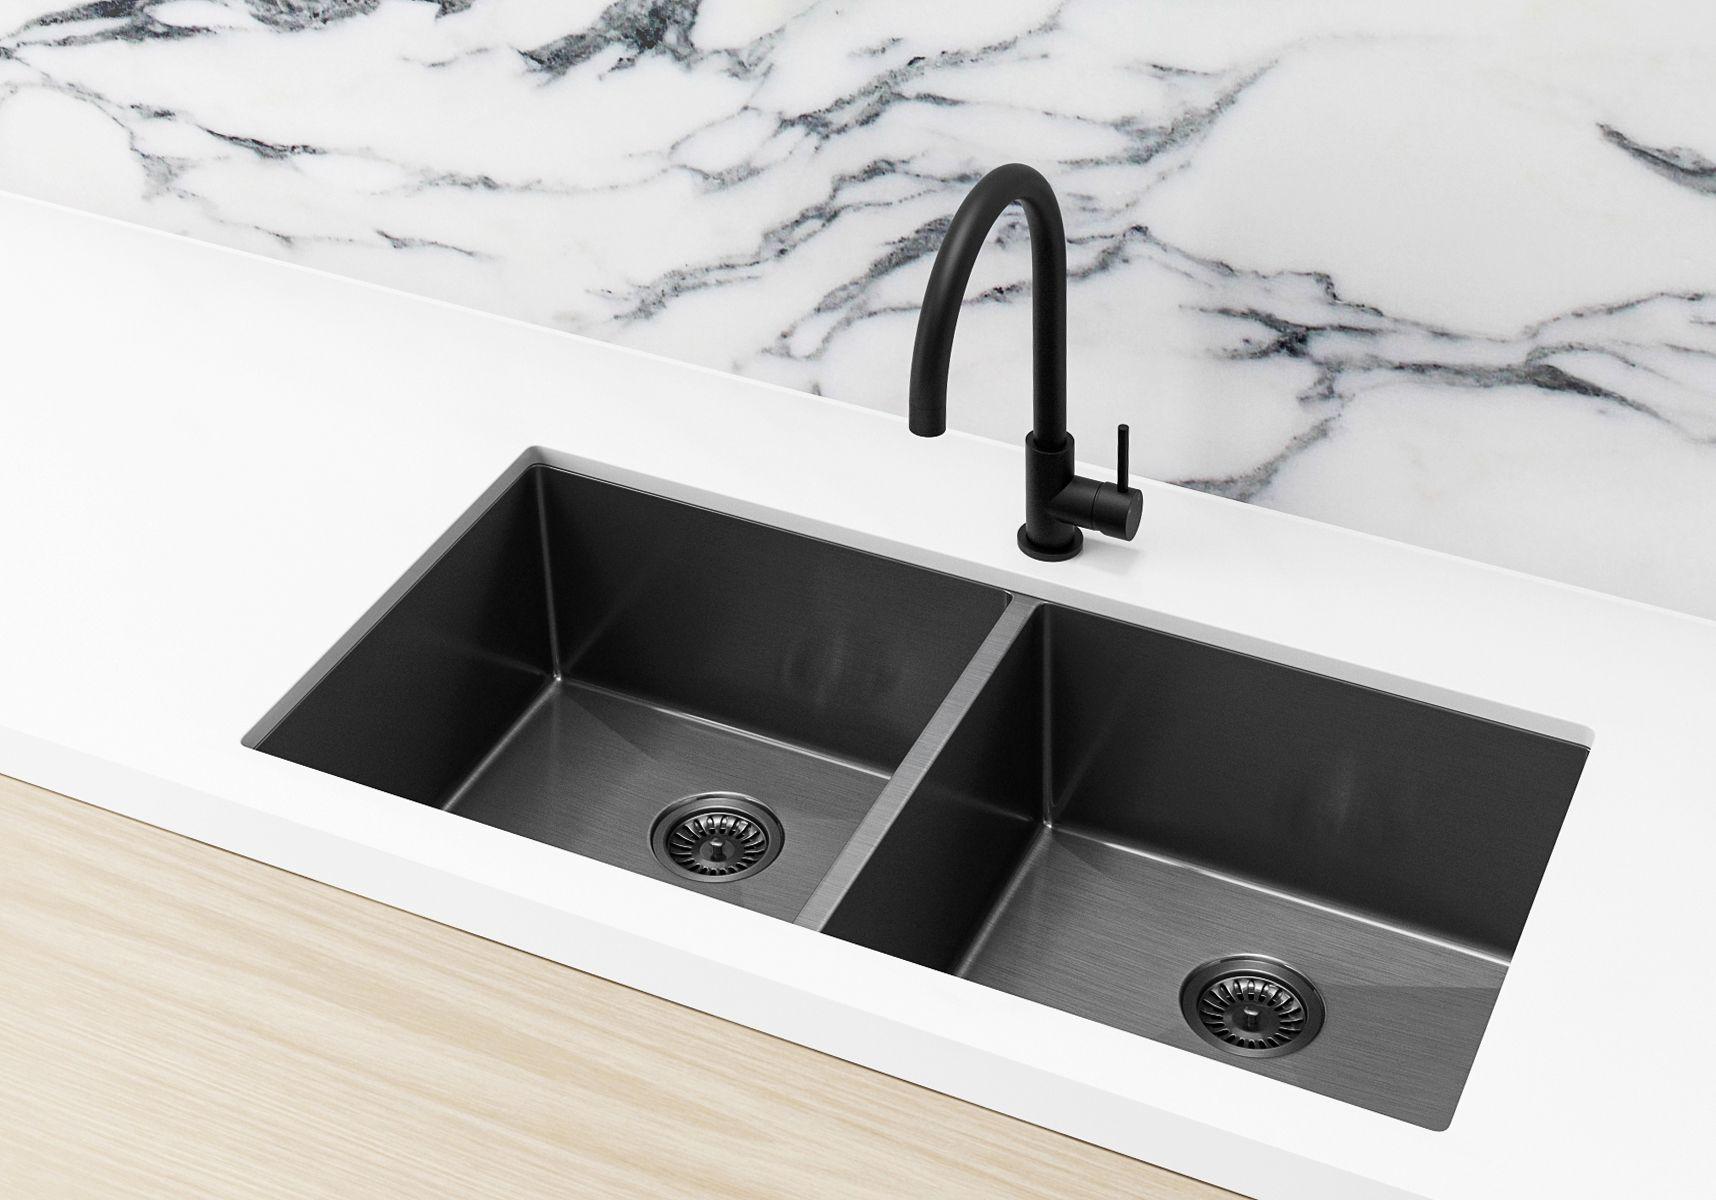 Kitchen Sink Double Bowl 860 X 440 Gunmetal Black In 2020 Double Bowl Kitchen Sink Sink Double Bowl Sink